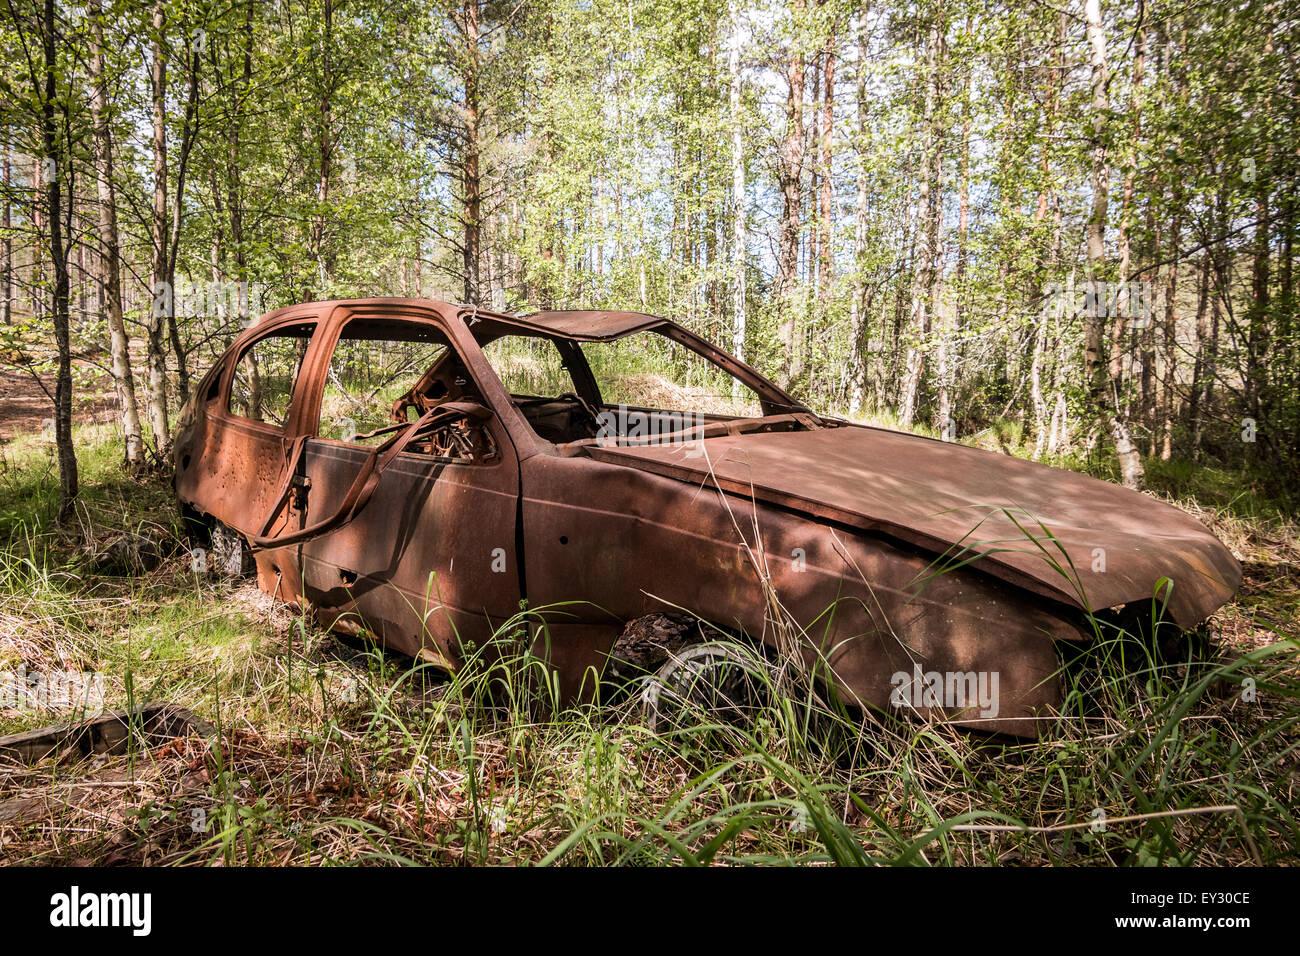 An abandoned car - Stock Image